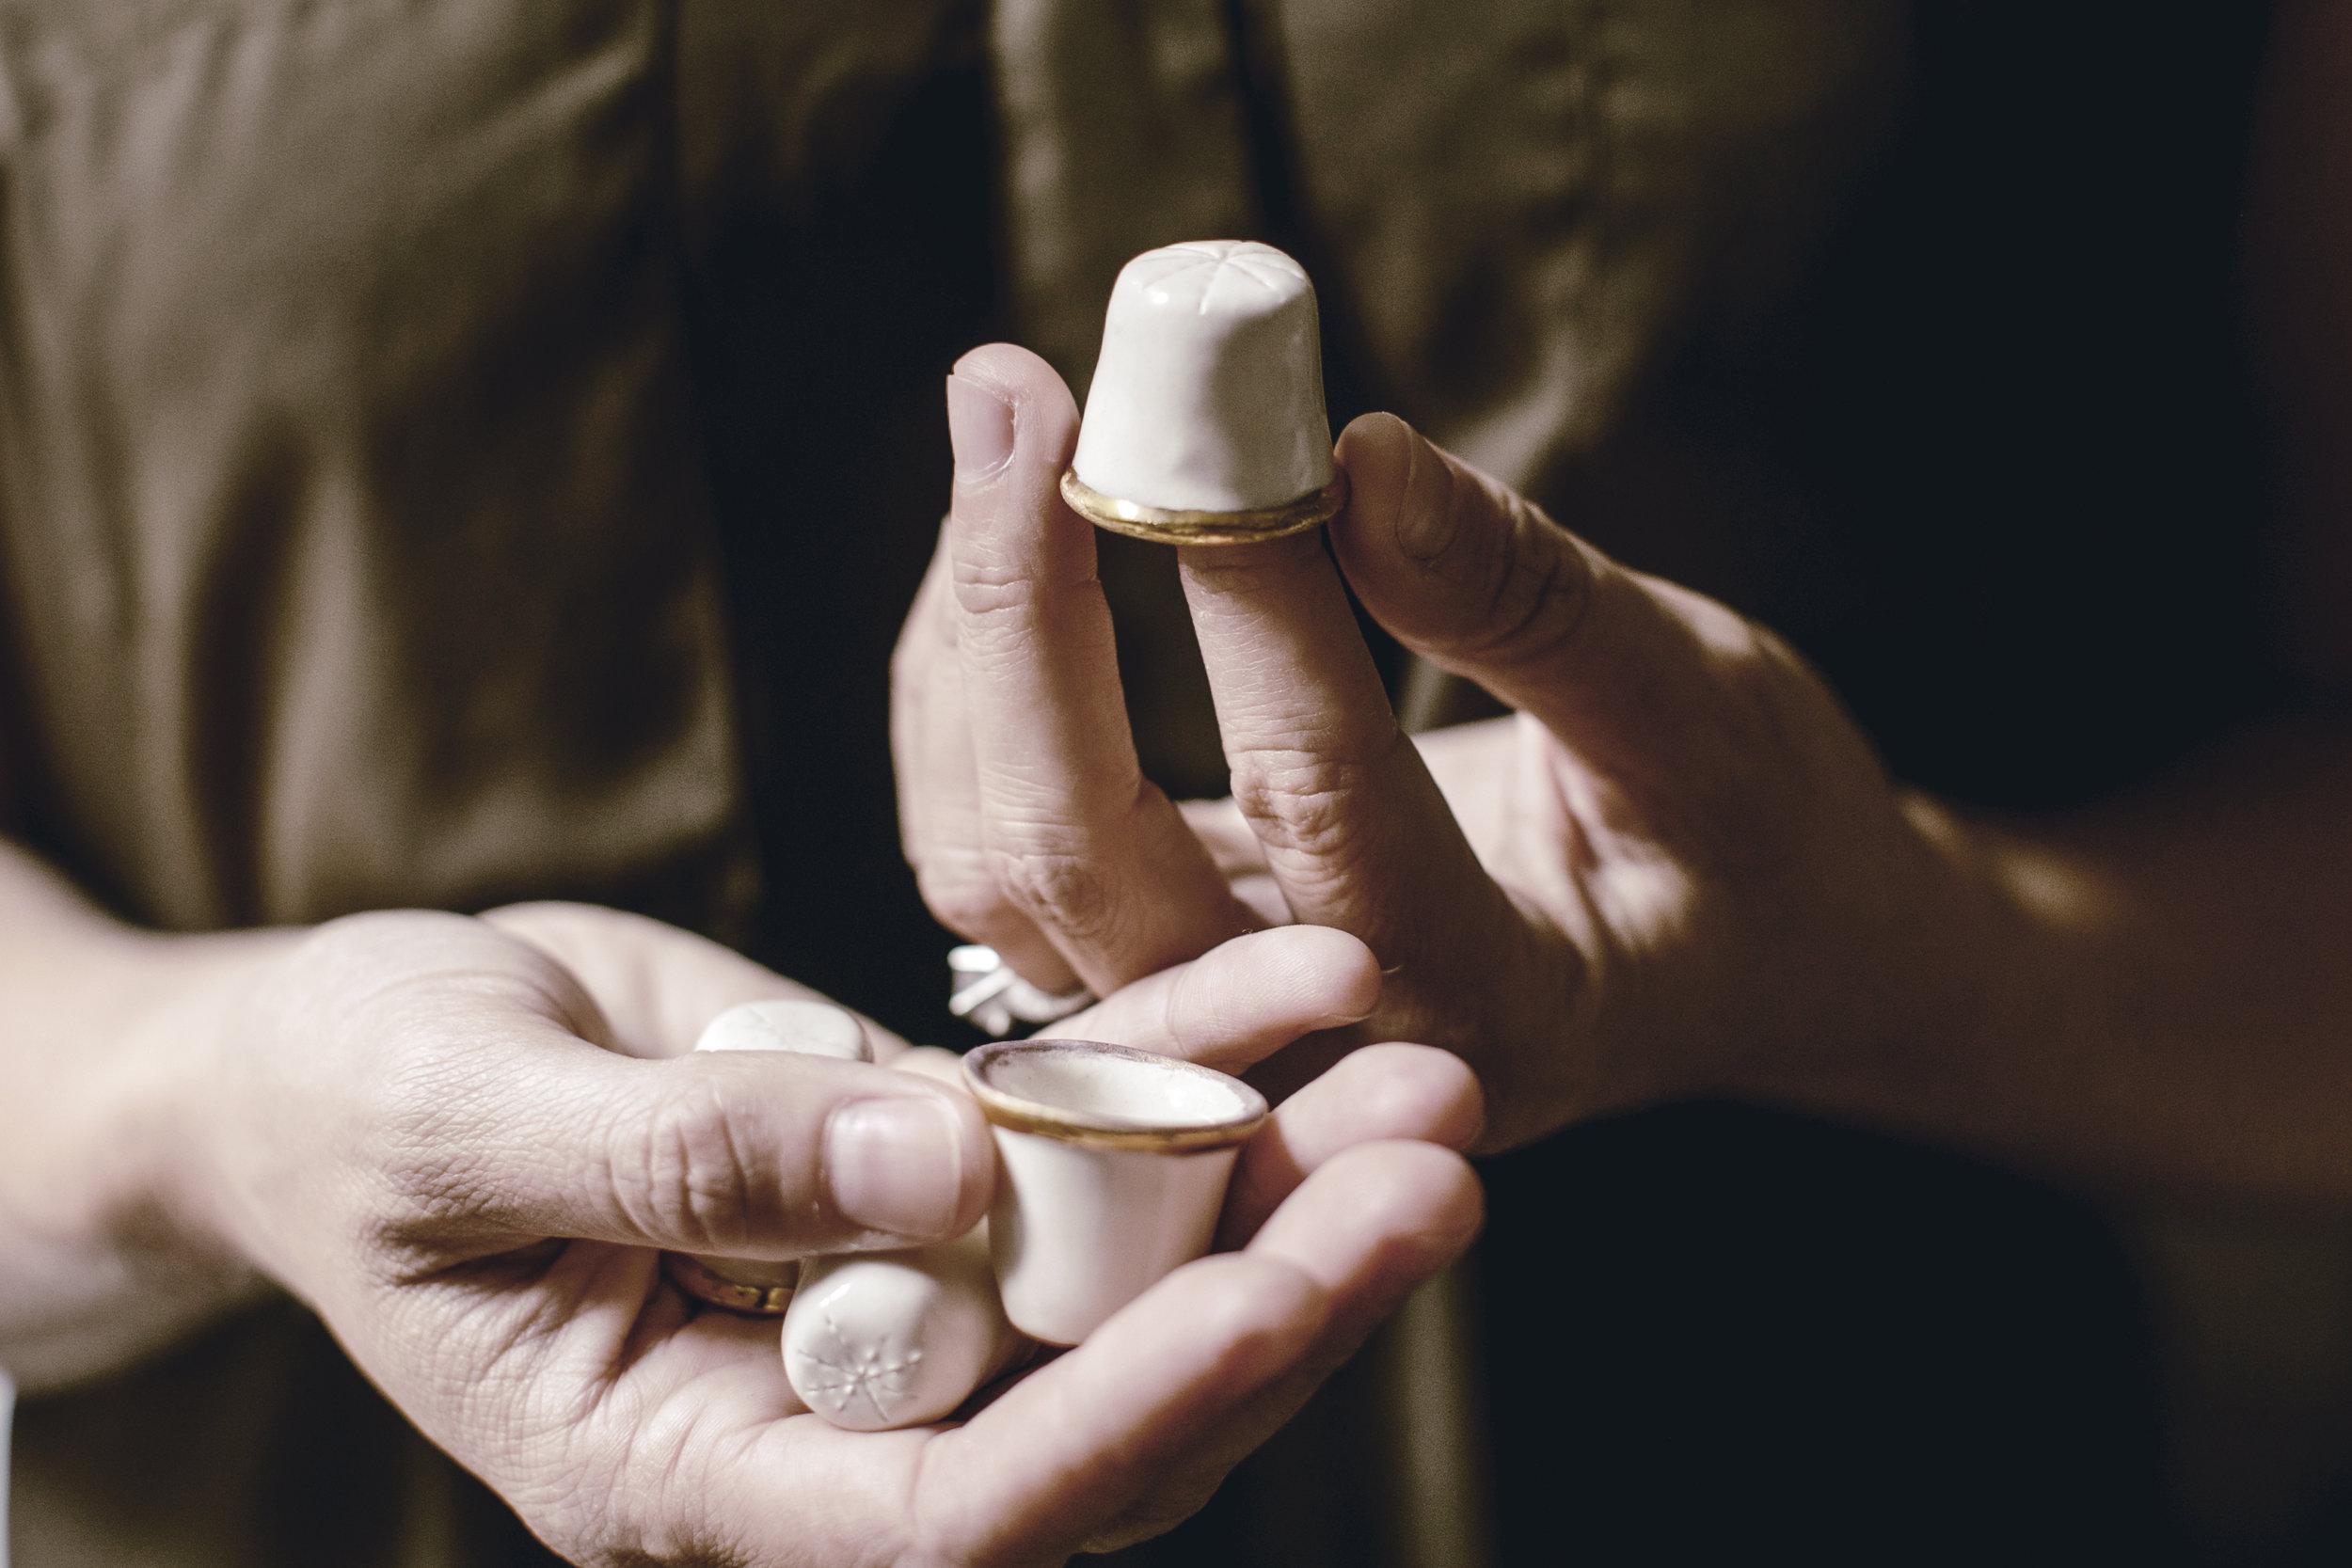 handmade ceramic thimbles / keepsake gift / heirloomed